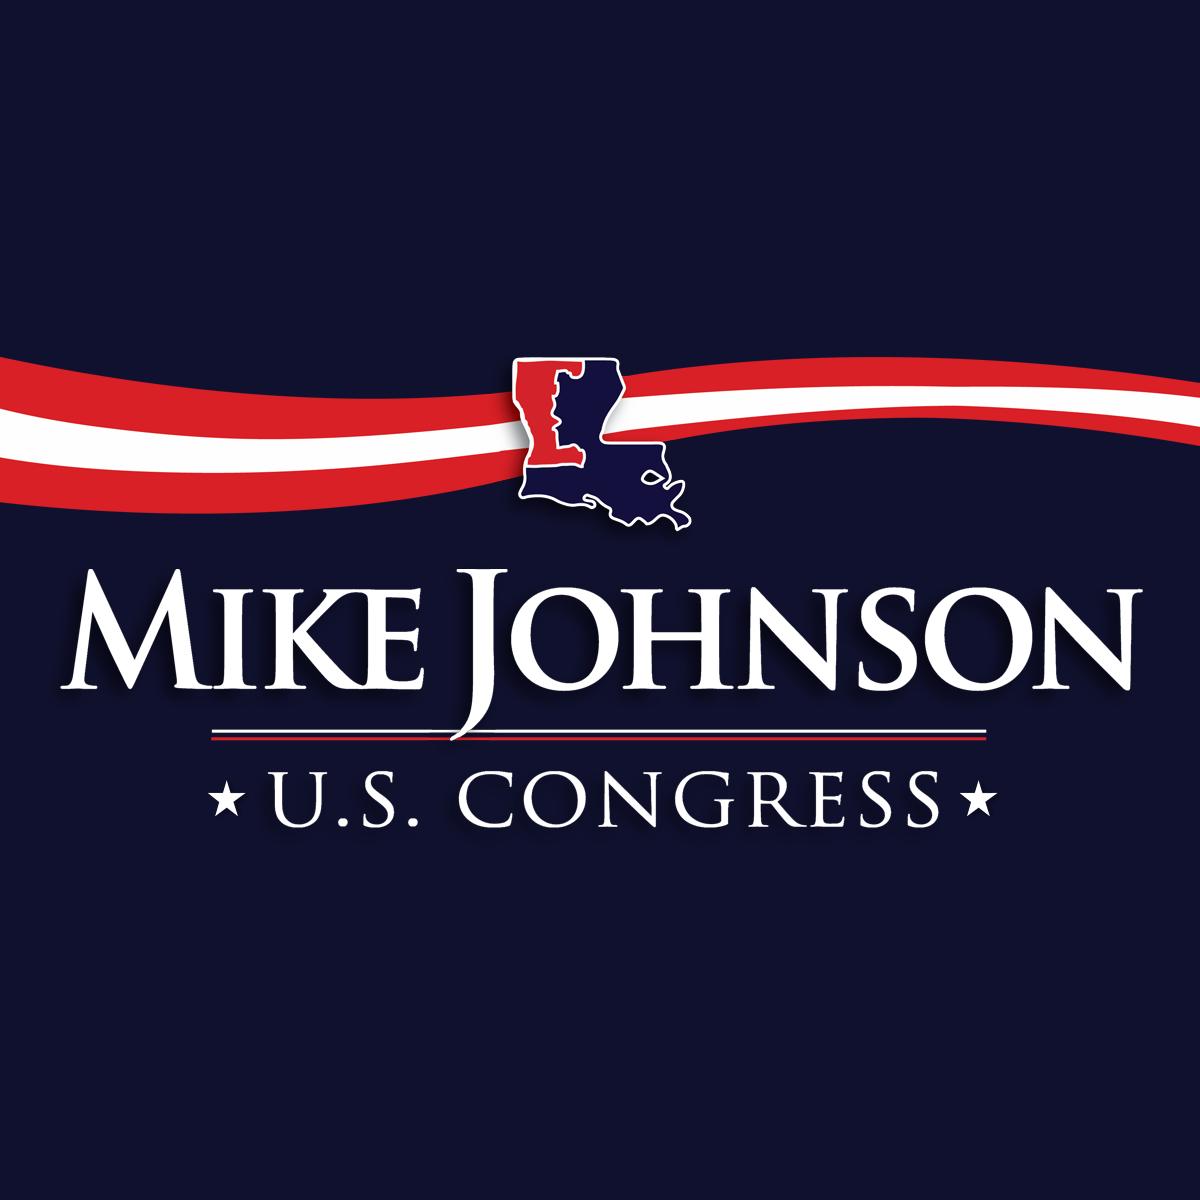 Johnson logo wr sized white